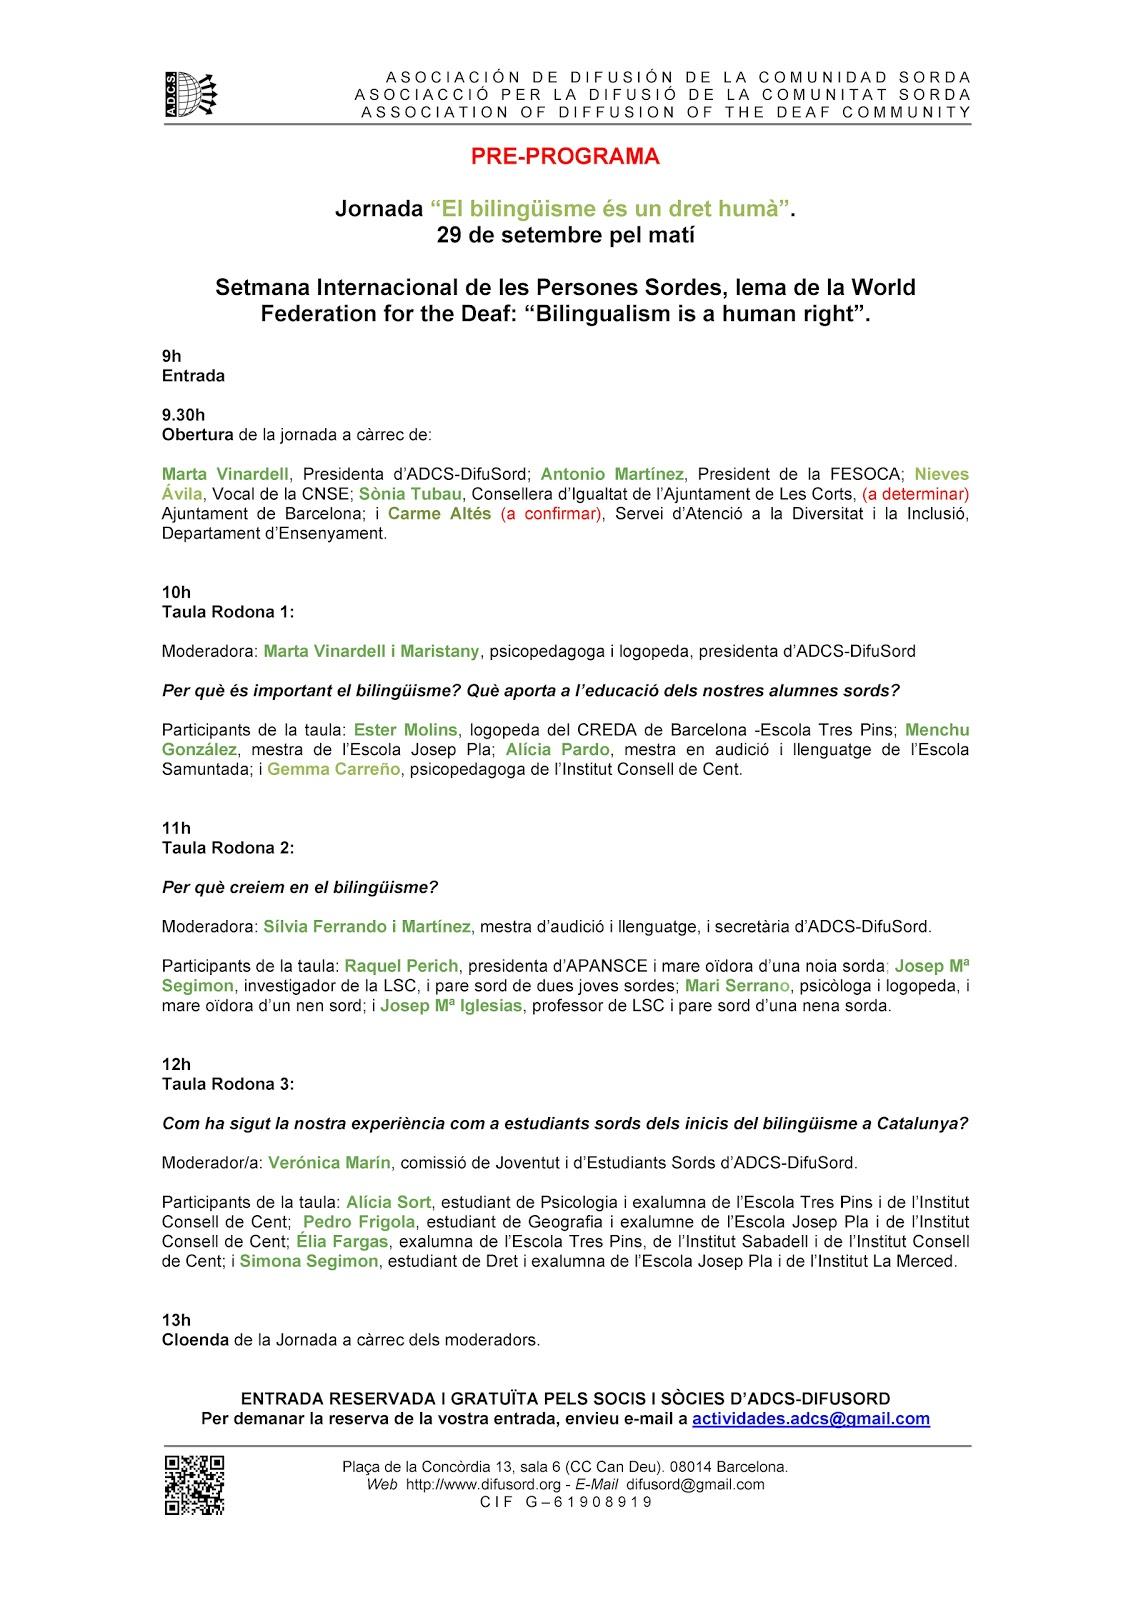 "Jornada ""El bilingüismo, un derecho humano"" - Barcelona 29 sept.'12 Jornada29S"